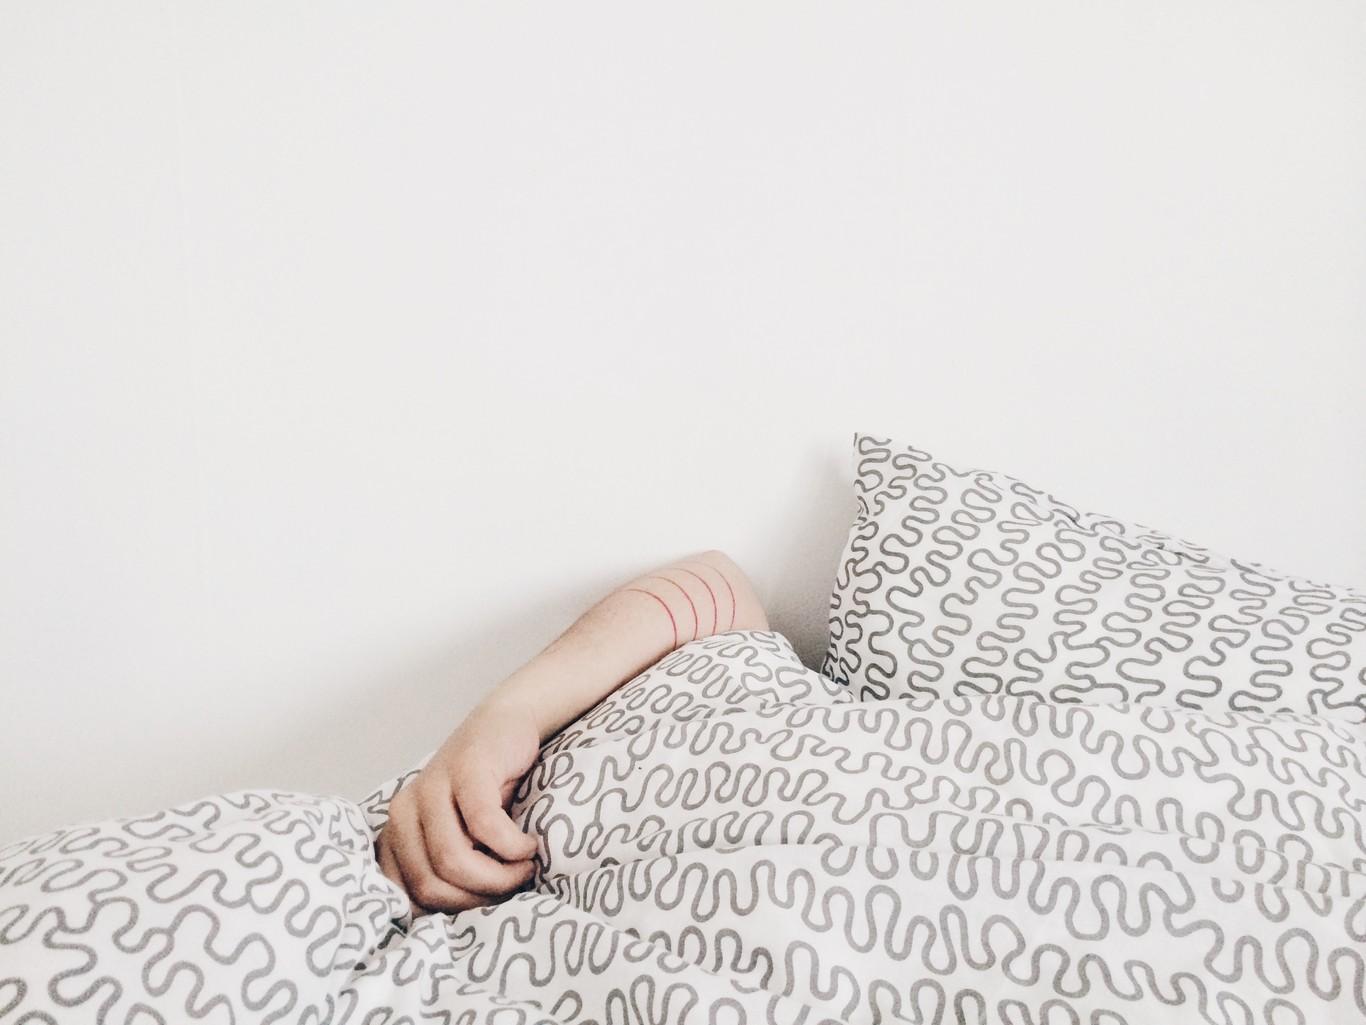 como hay que dormir para adelgazar